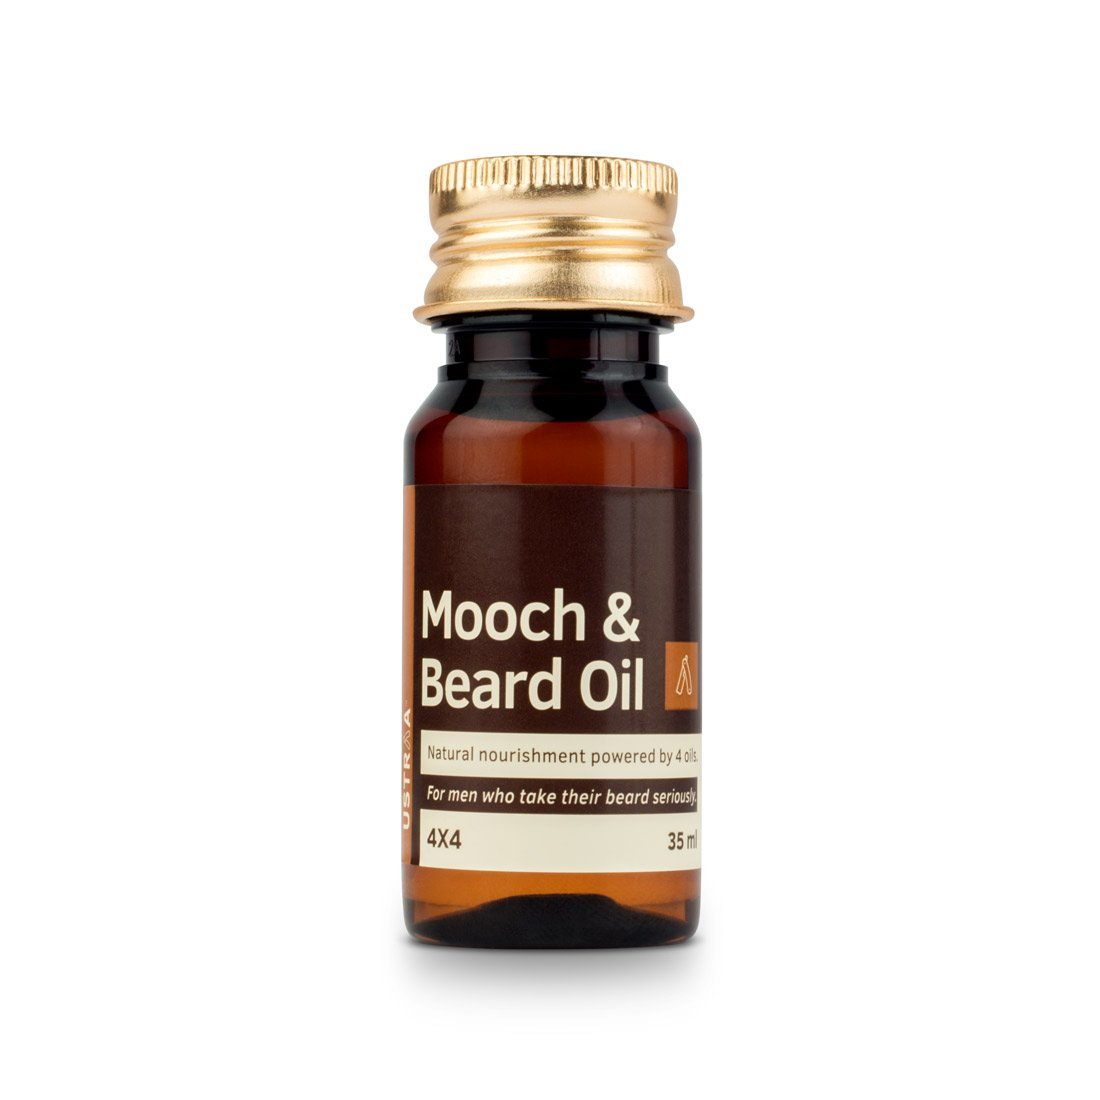 Ustraa Mooch and Beard Oil 4x4 for men - 35 ml